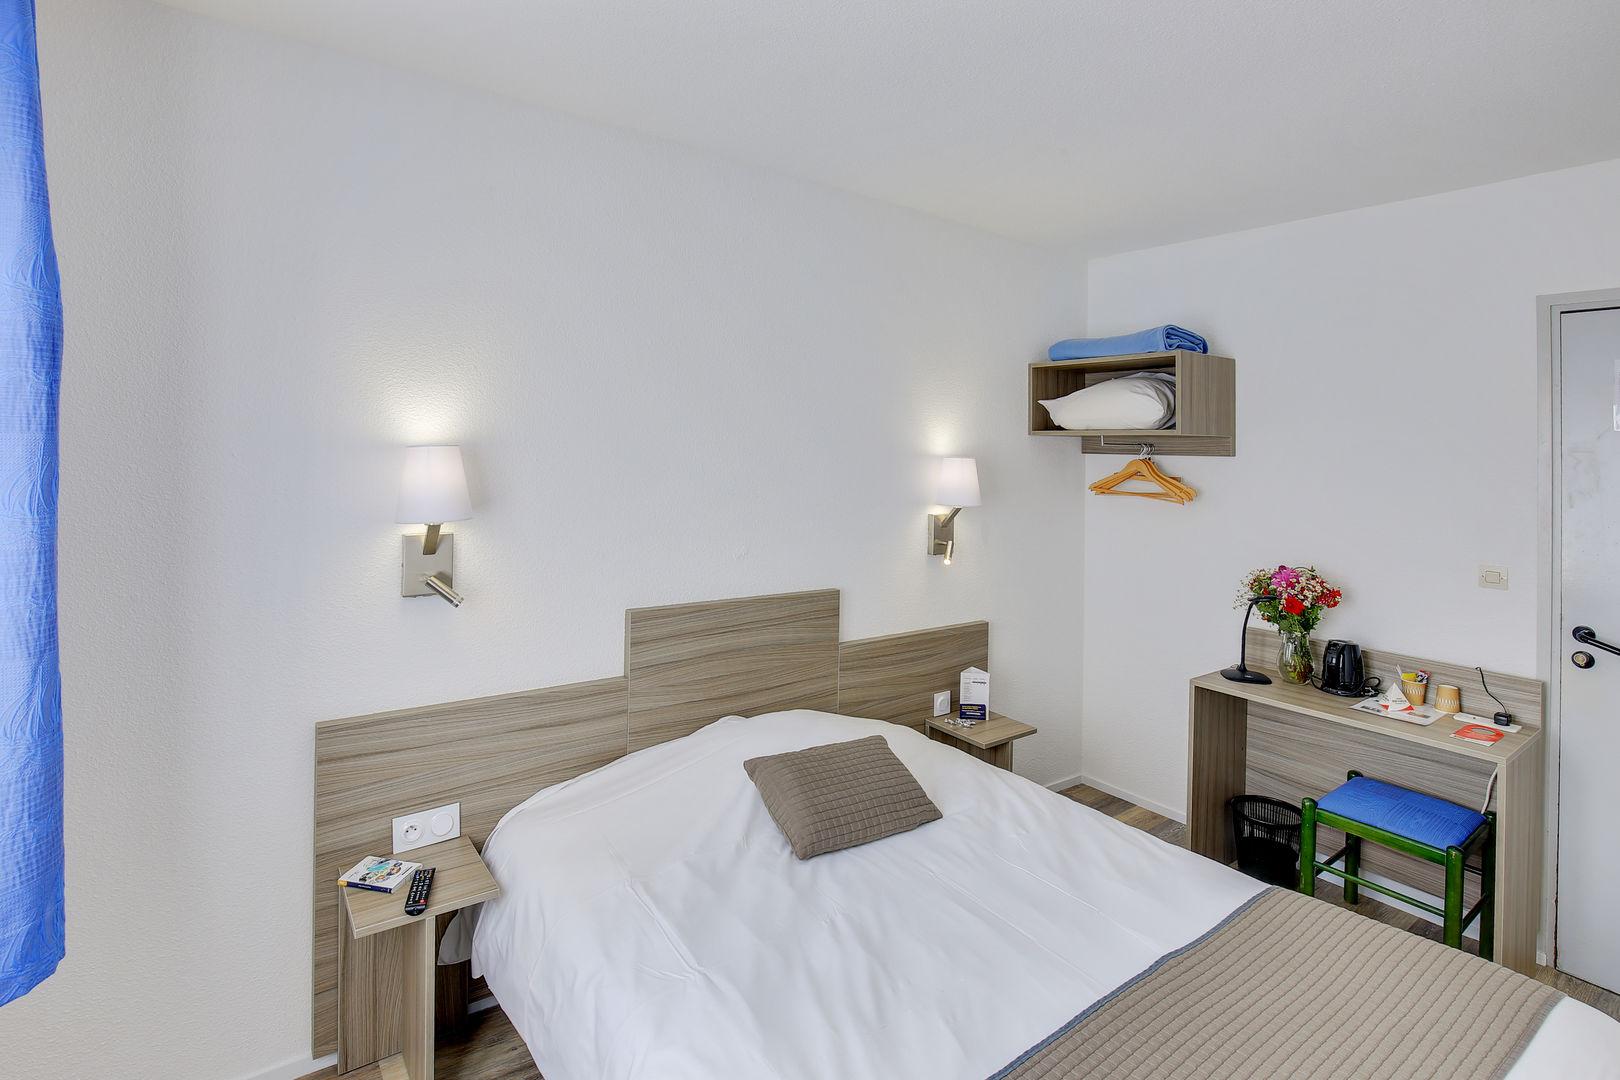 chambre2_hotel-chanmp-de-mars_st-brieuc